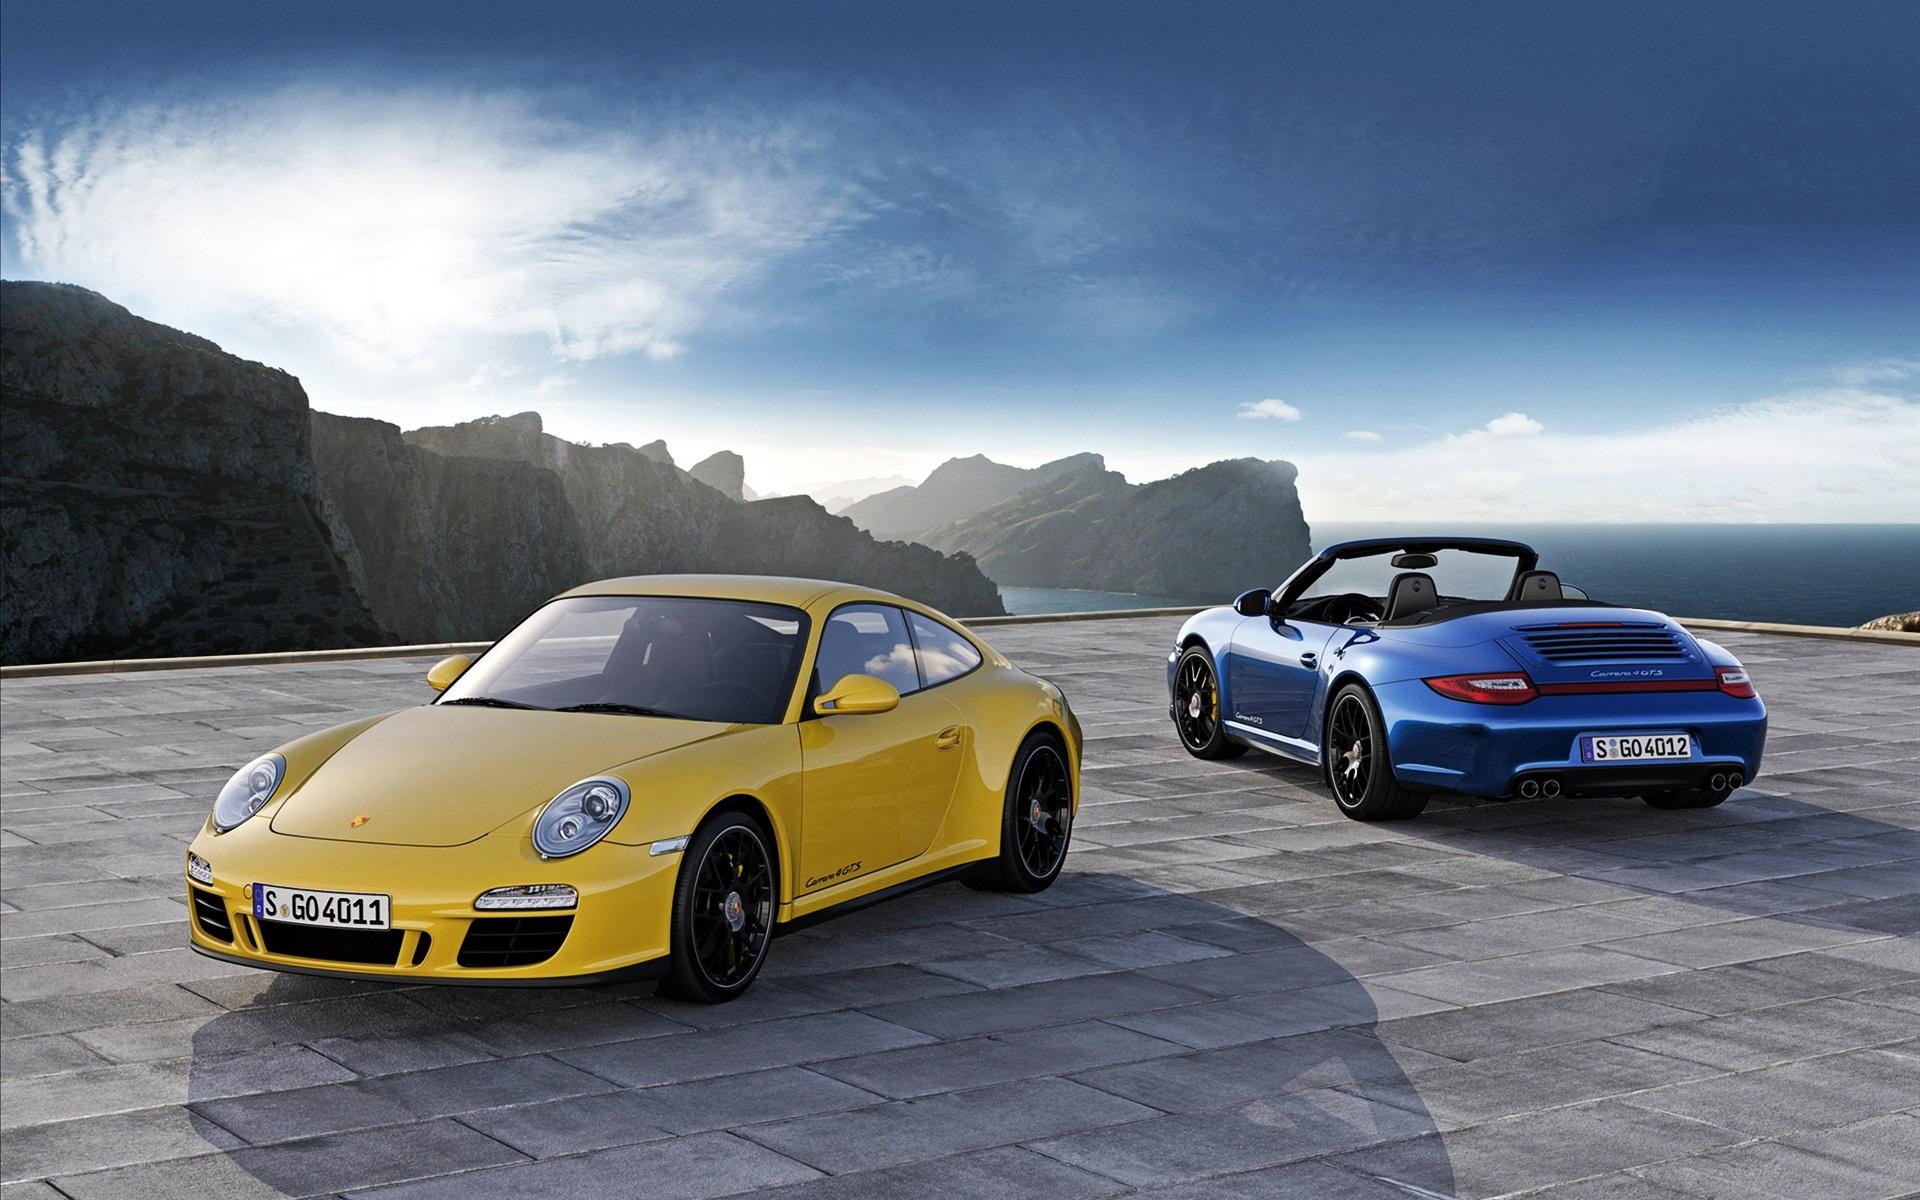 2012 porsche 911 carrera 4 gts wallpapers hd wallpapers - Porsche Wallpapers For Desktop